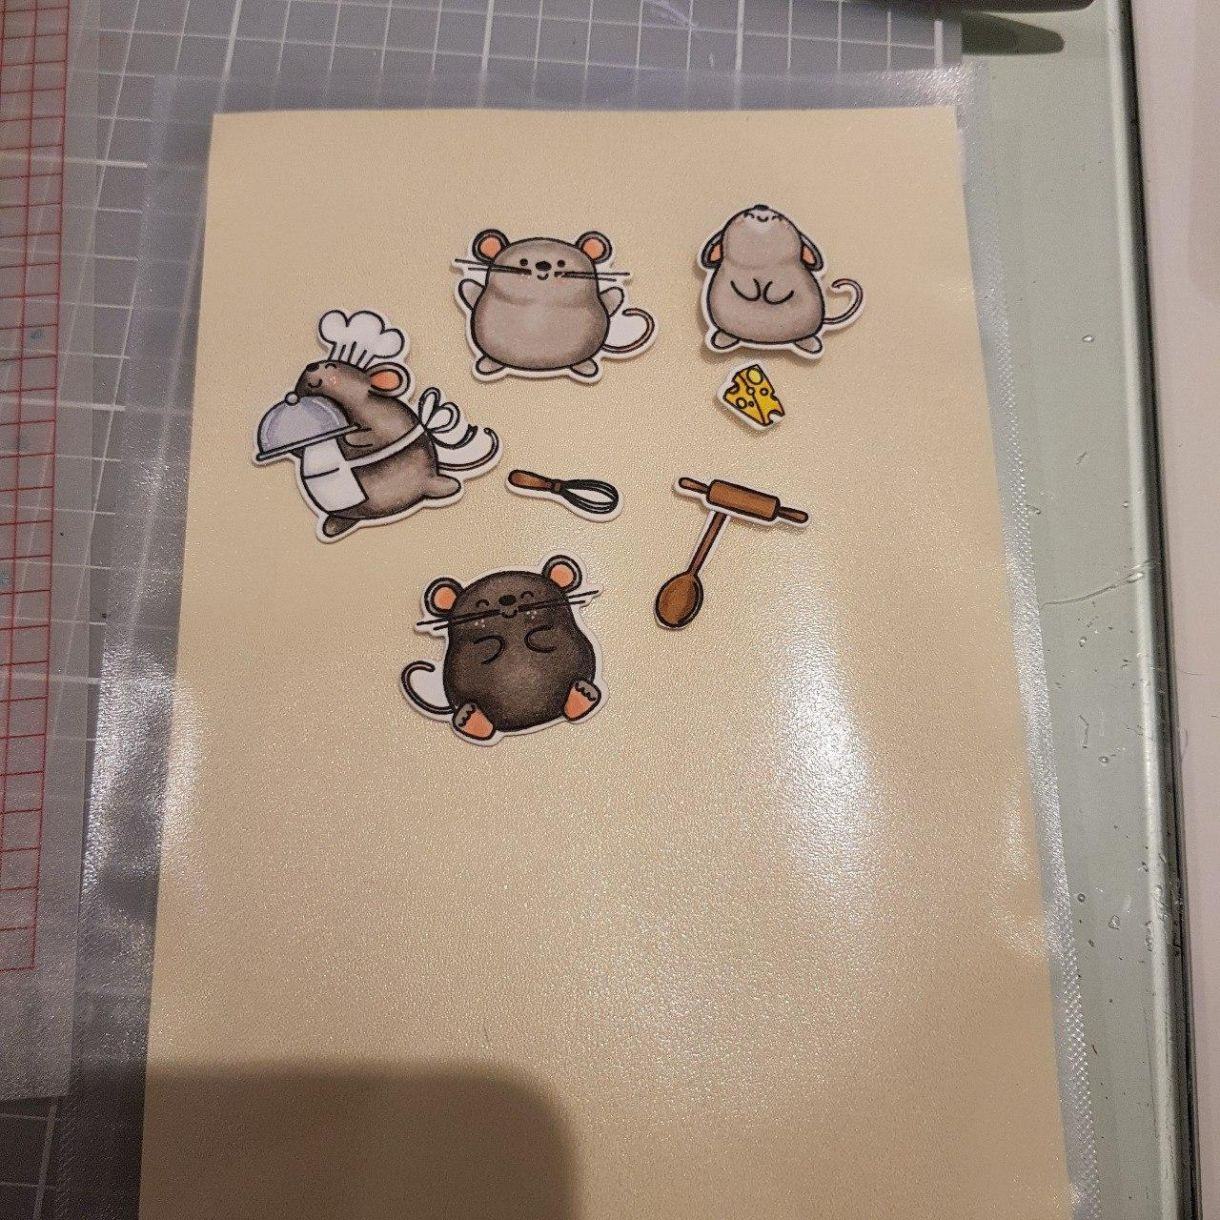 Cheese Wedge Mice